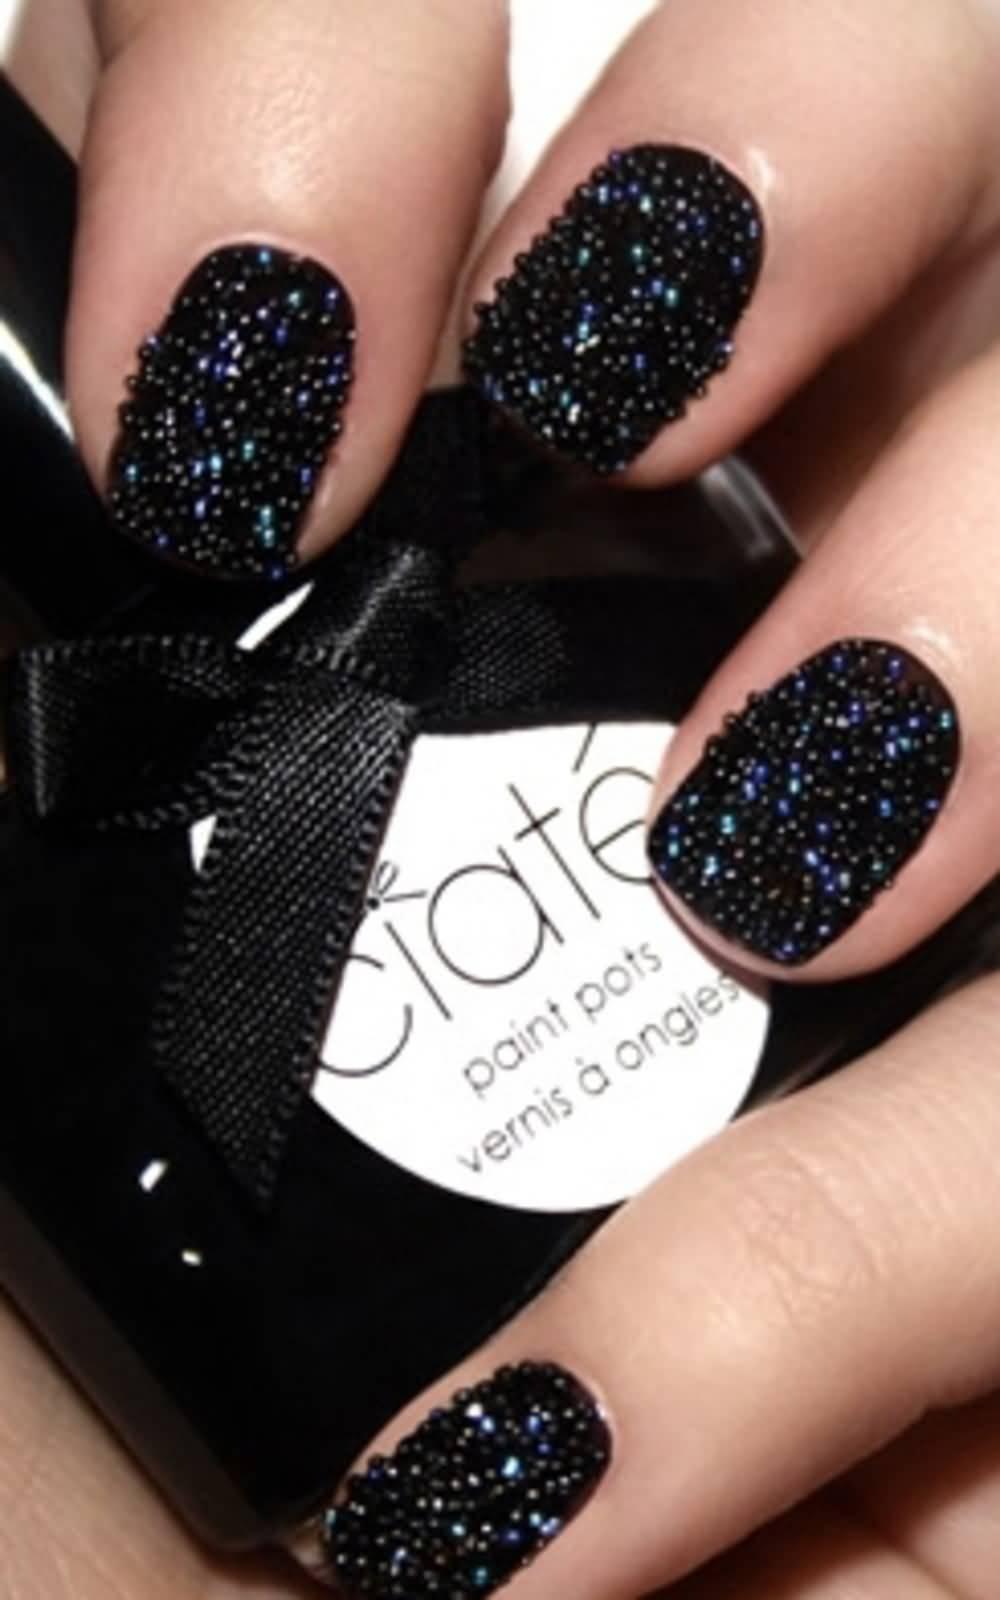 caviar-nail-polish4 +15 Hottest Caviar Manicure Creative Ideas to Apply in 2020